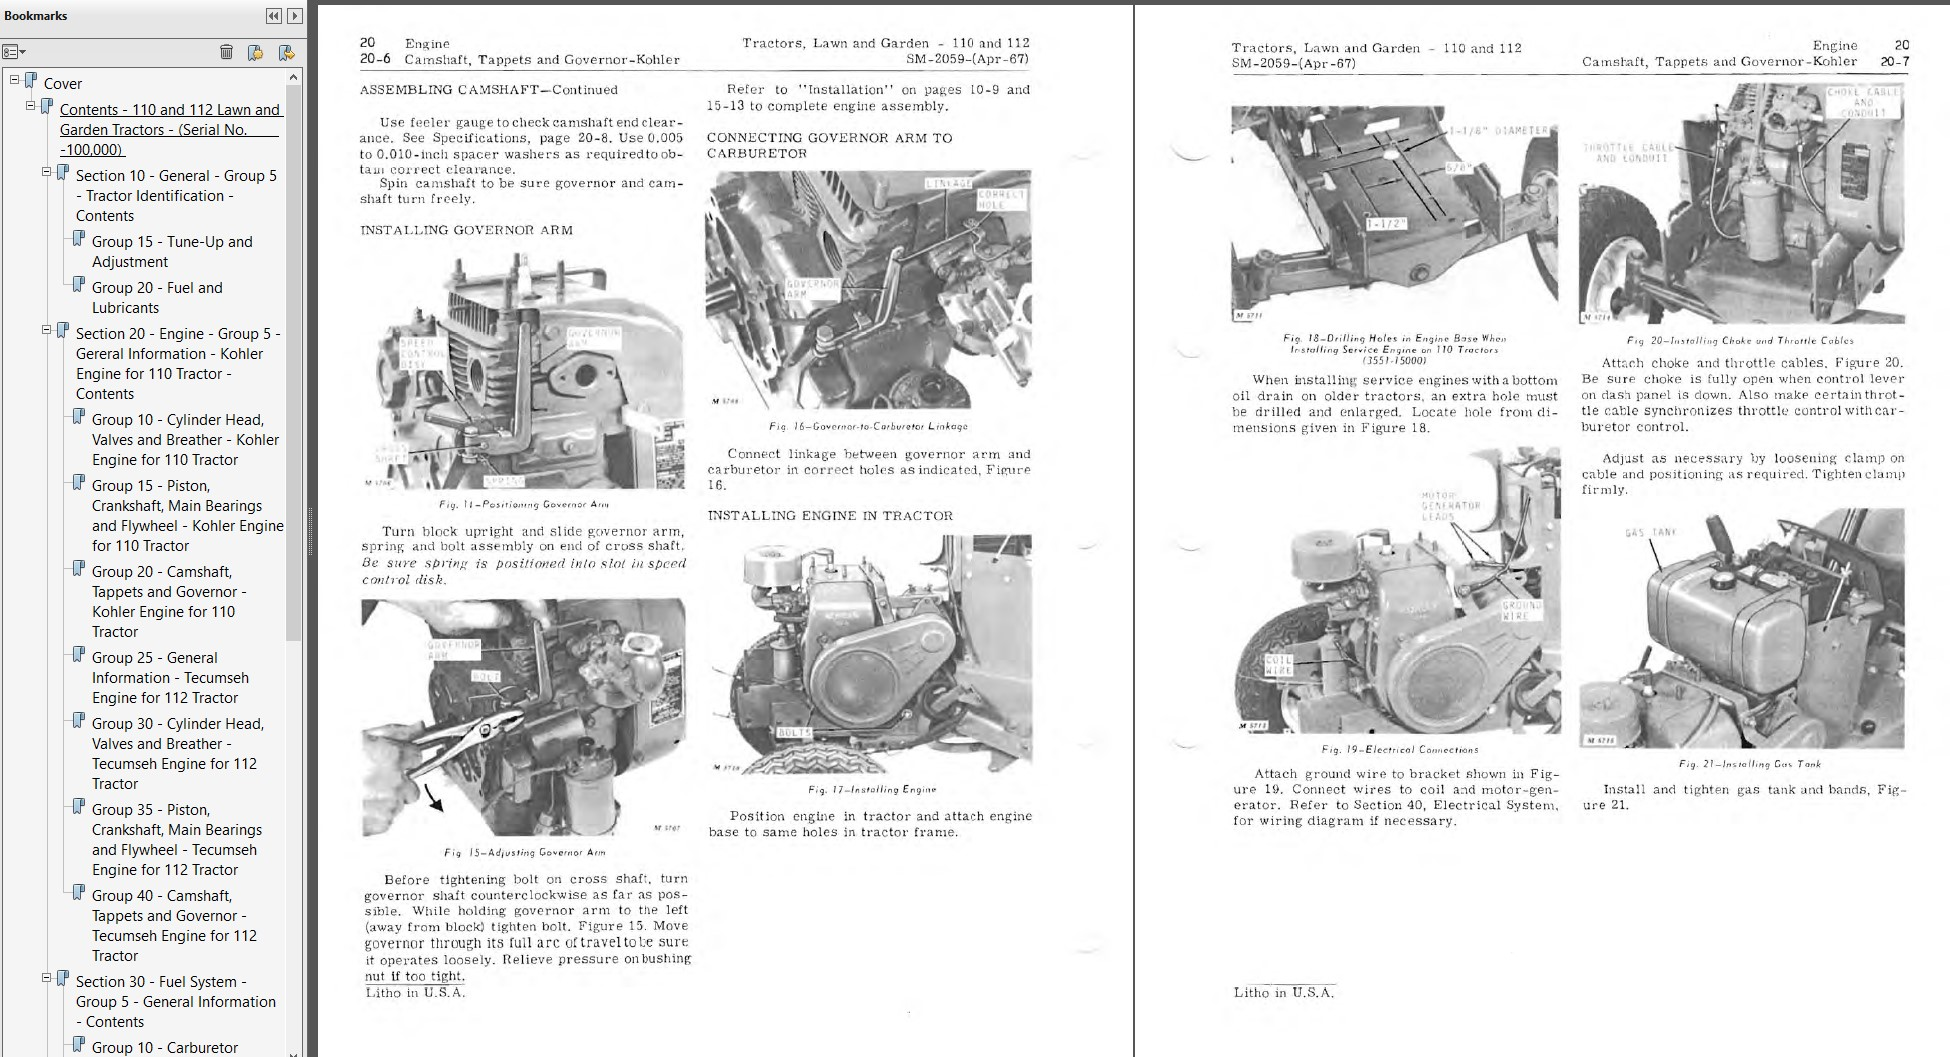 SERVICE MANUAL FOR JOHN DEERE 112 LAWN MOWER GARDEN TRACTOR HH100 ENGINE